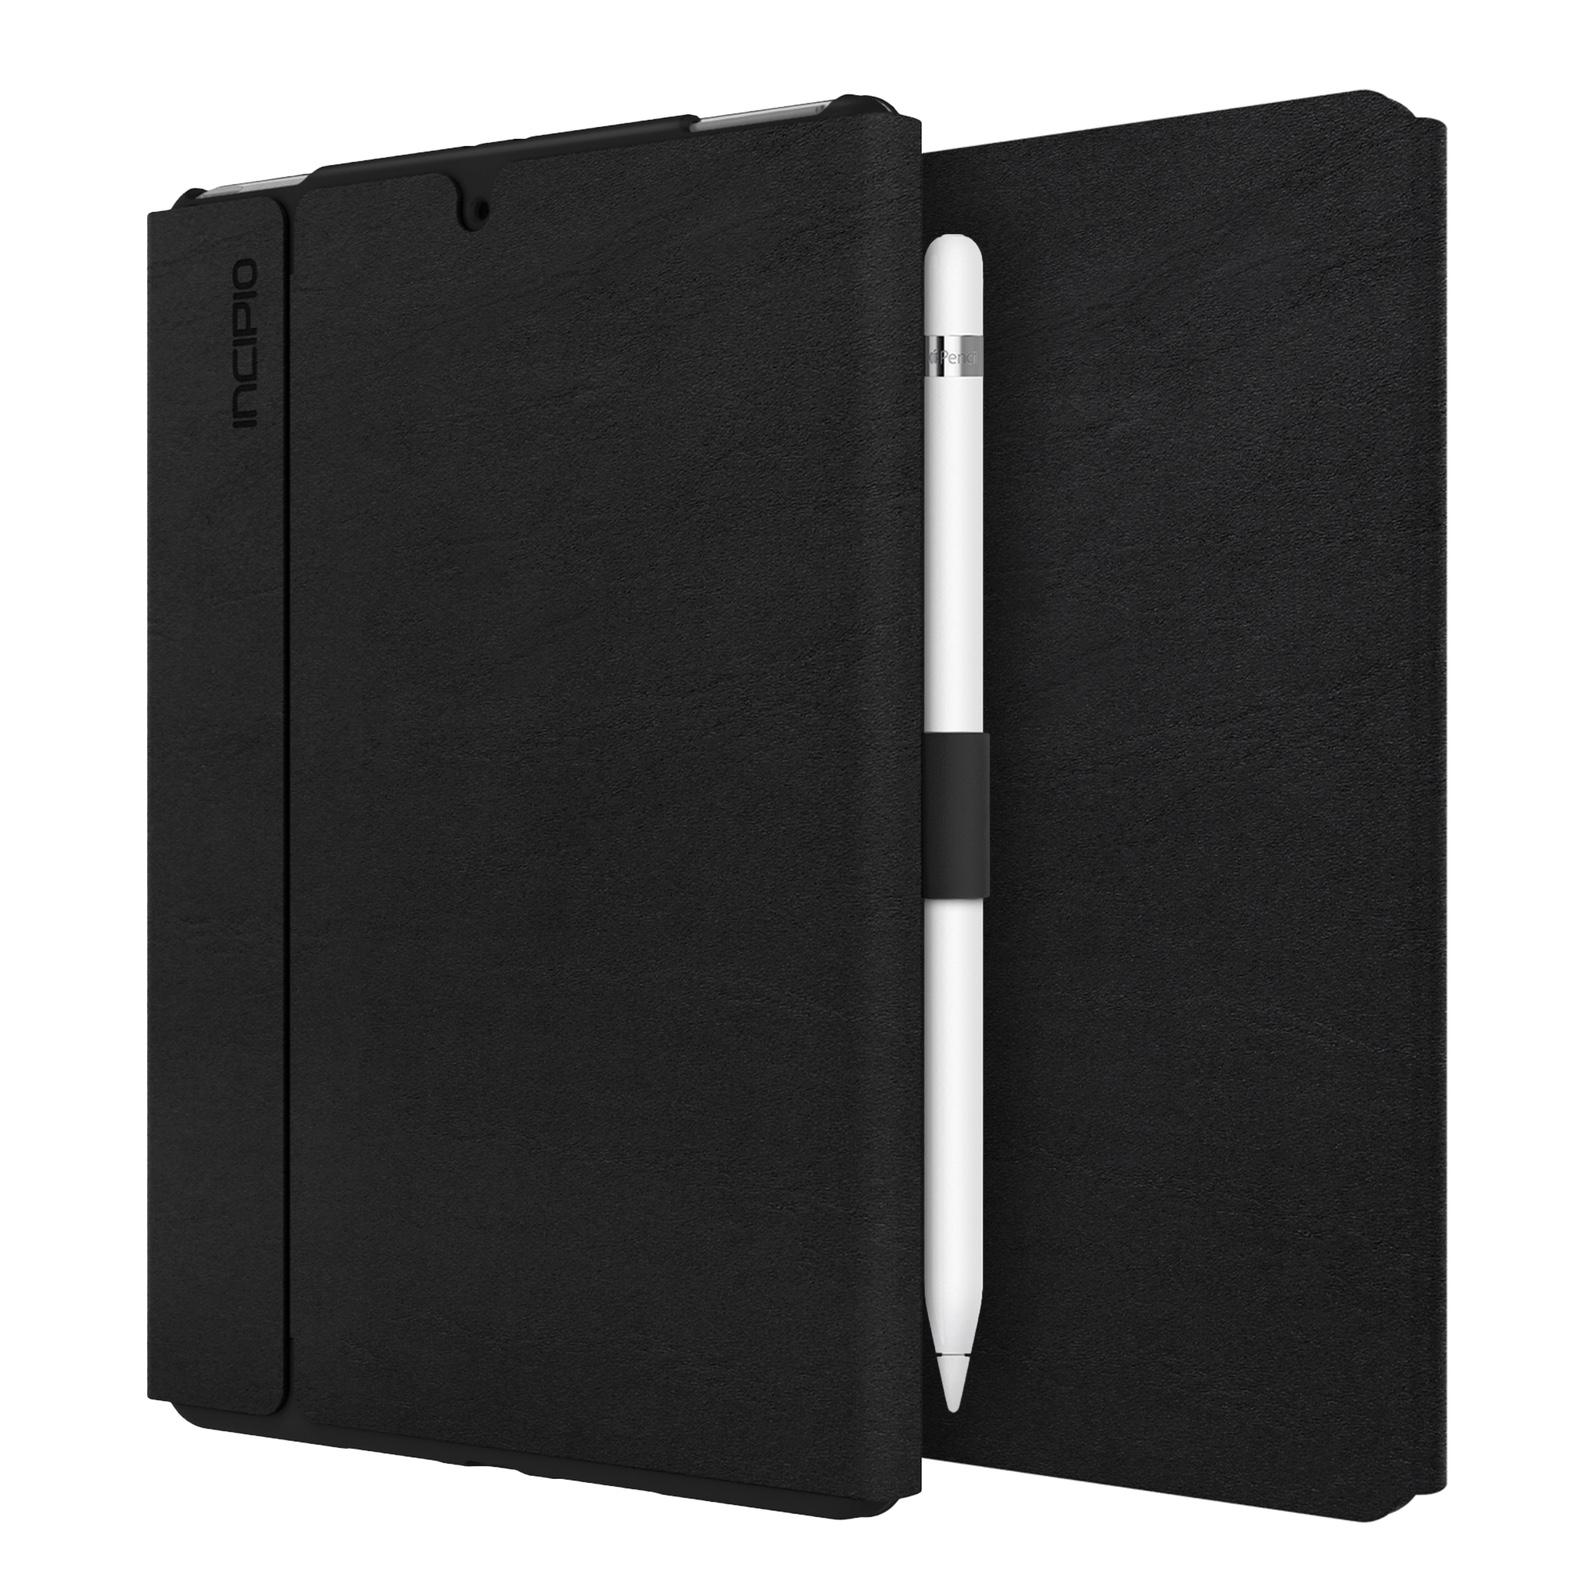 New iPAD 10.2 pouces Etui Folio de Protection Faraday Noir